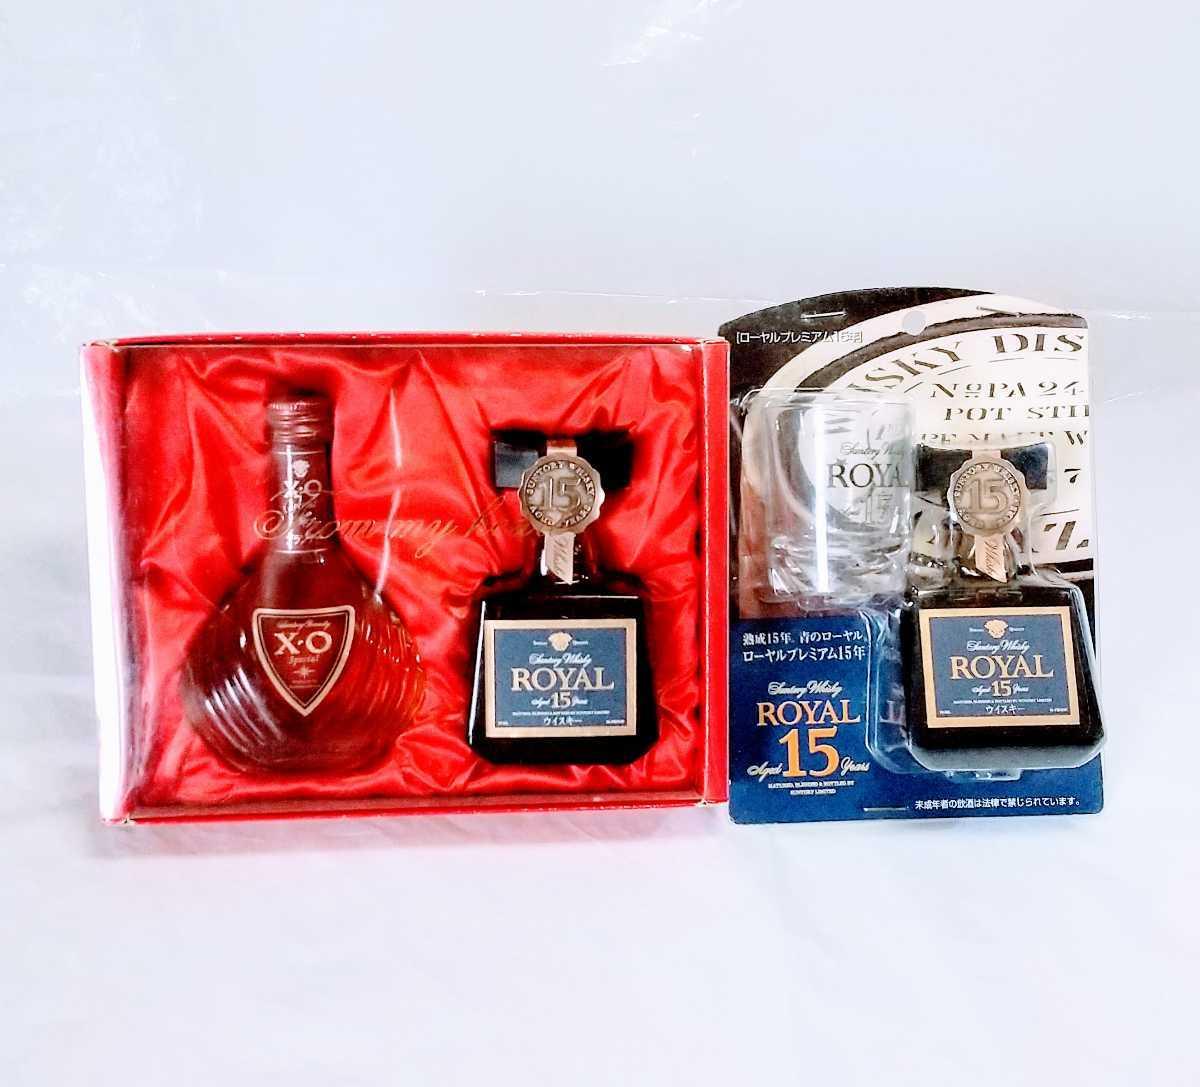 SUNTORY WHISKY ミニボトル ミニチュア グラス 付き 50ml サントリー ウイスキー ローヤル15年 royal xo _画像2